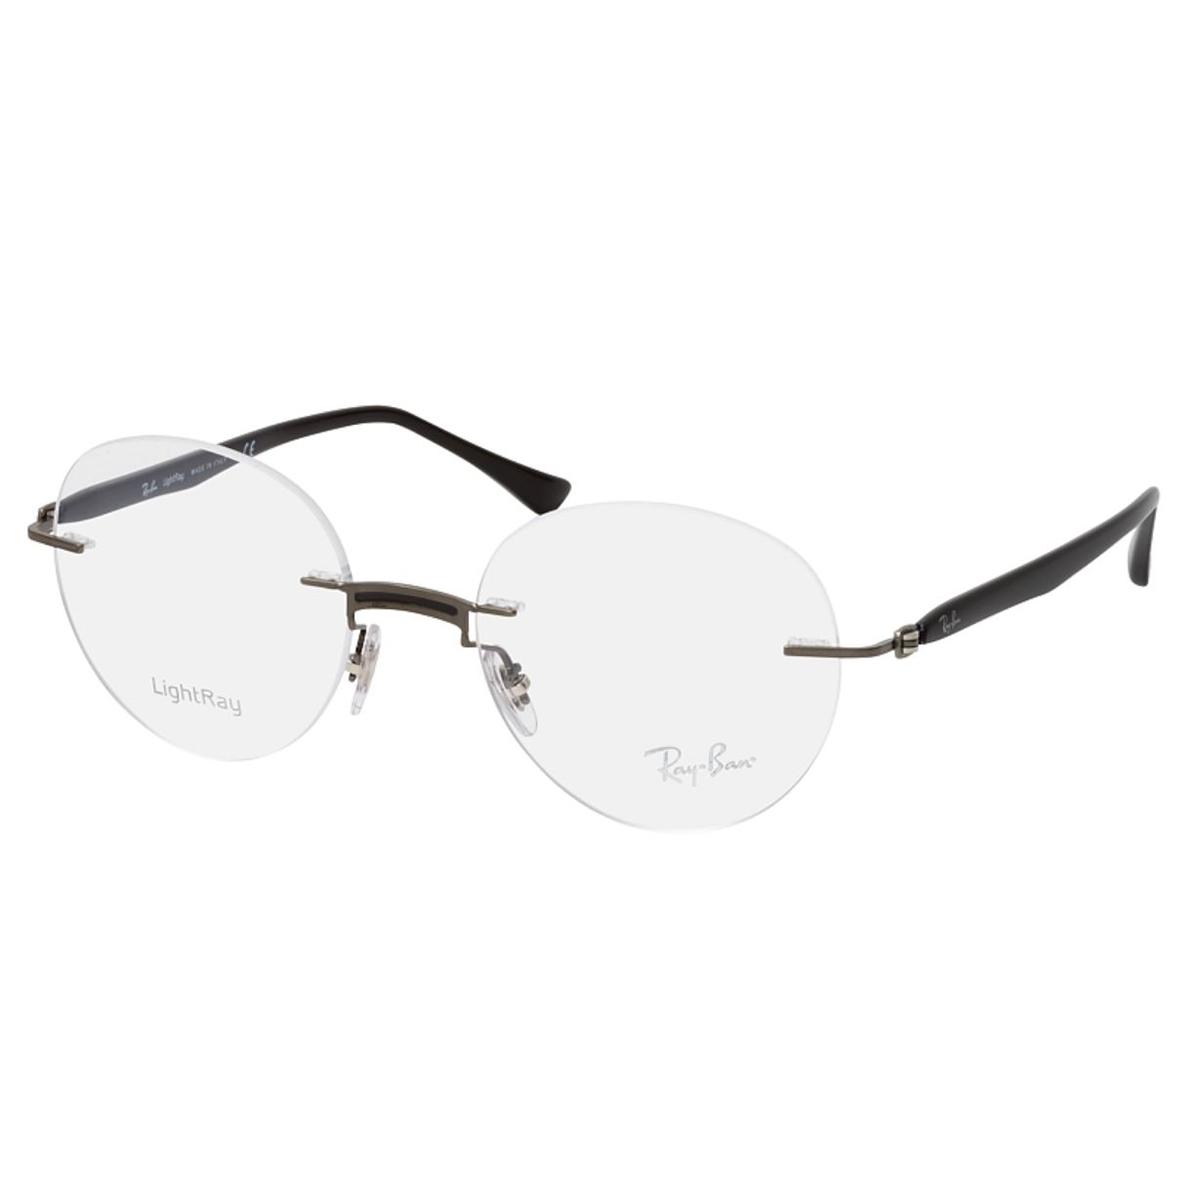 Óculos de Grau RayBan RX8768 Redondo Titânio Preto Fosco